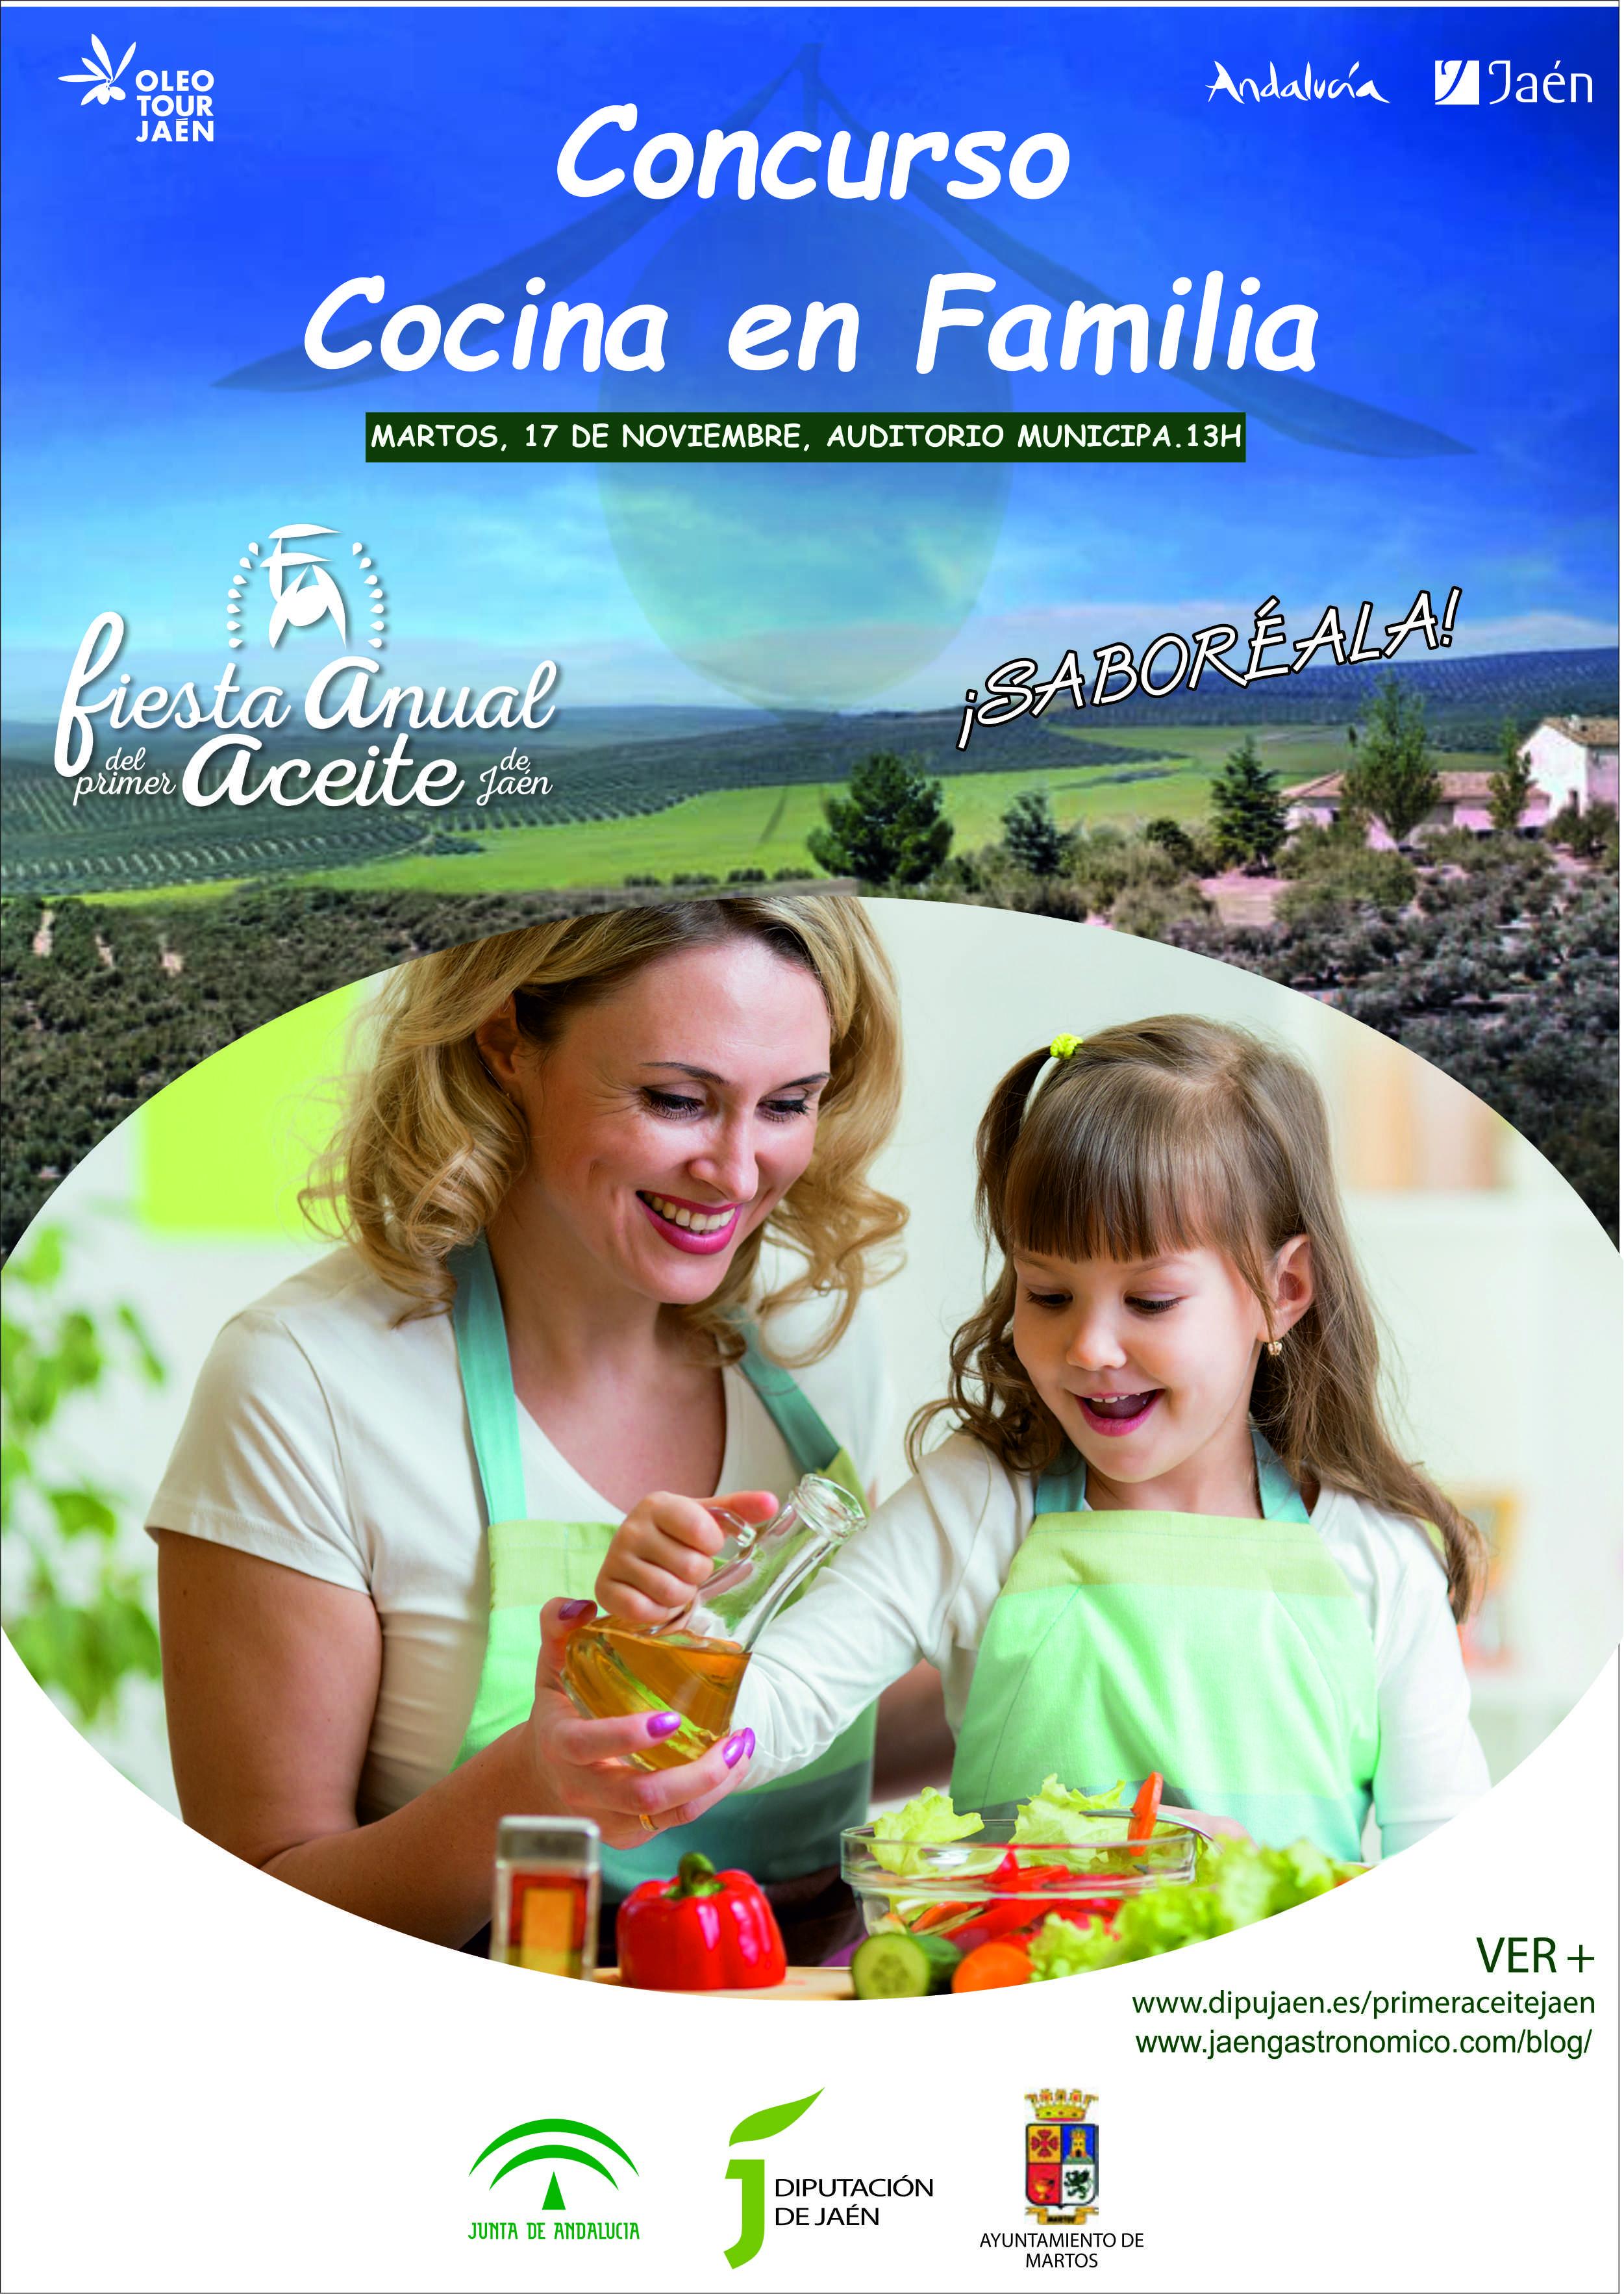 AAFF CARTEL CONCURSO COCINA FAMILIA BOCETO 3